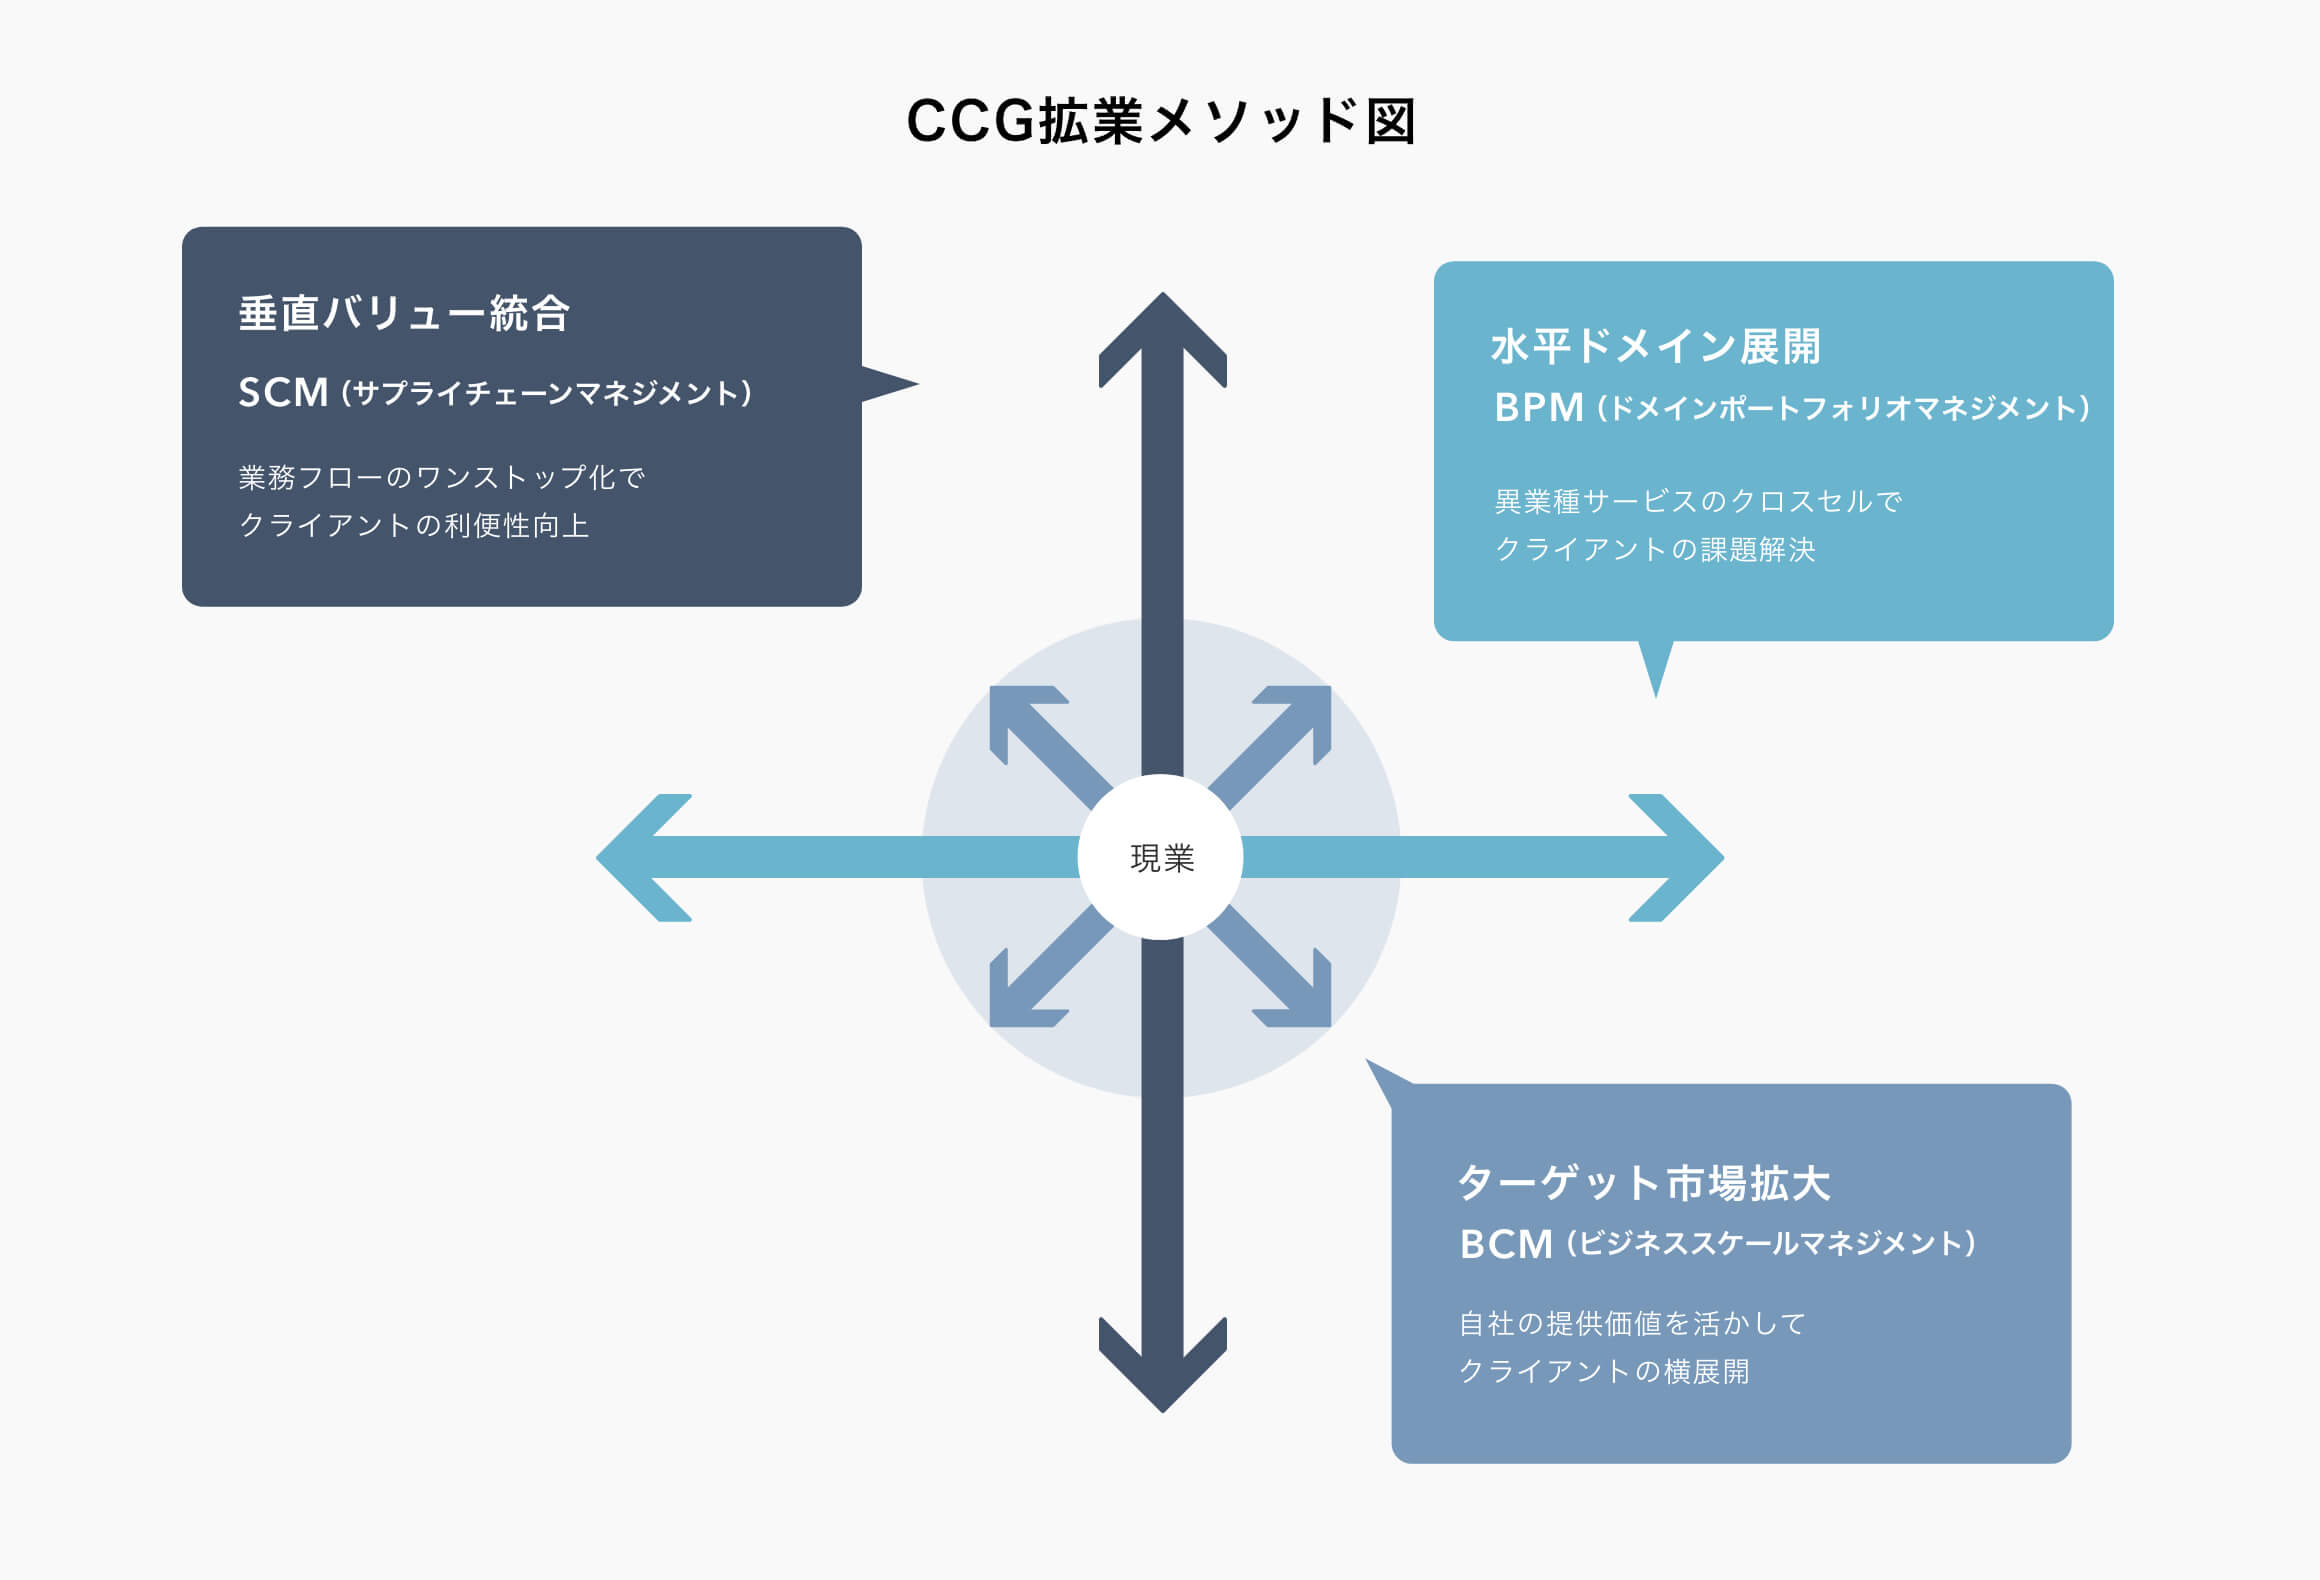 CCG拡業メソッド図